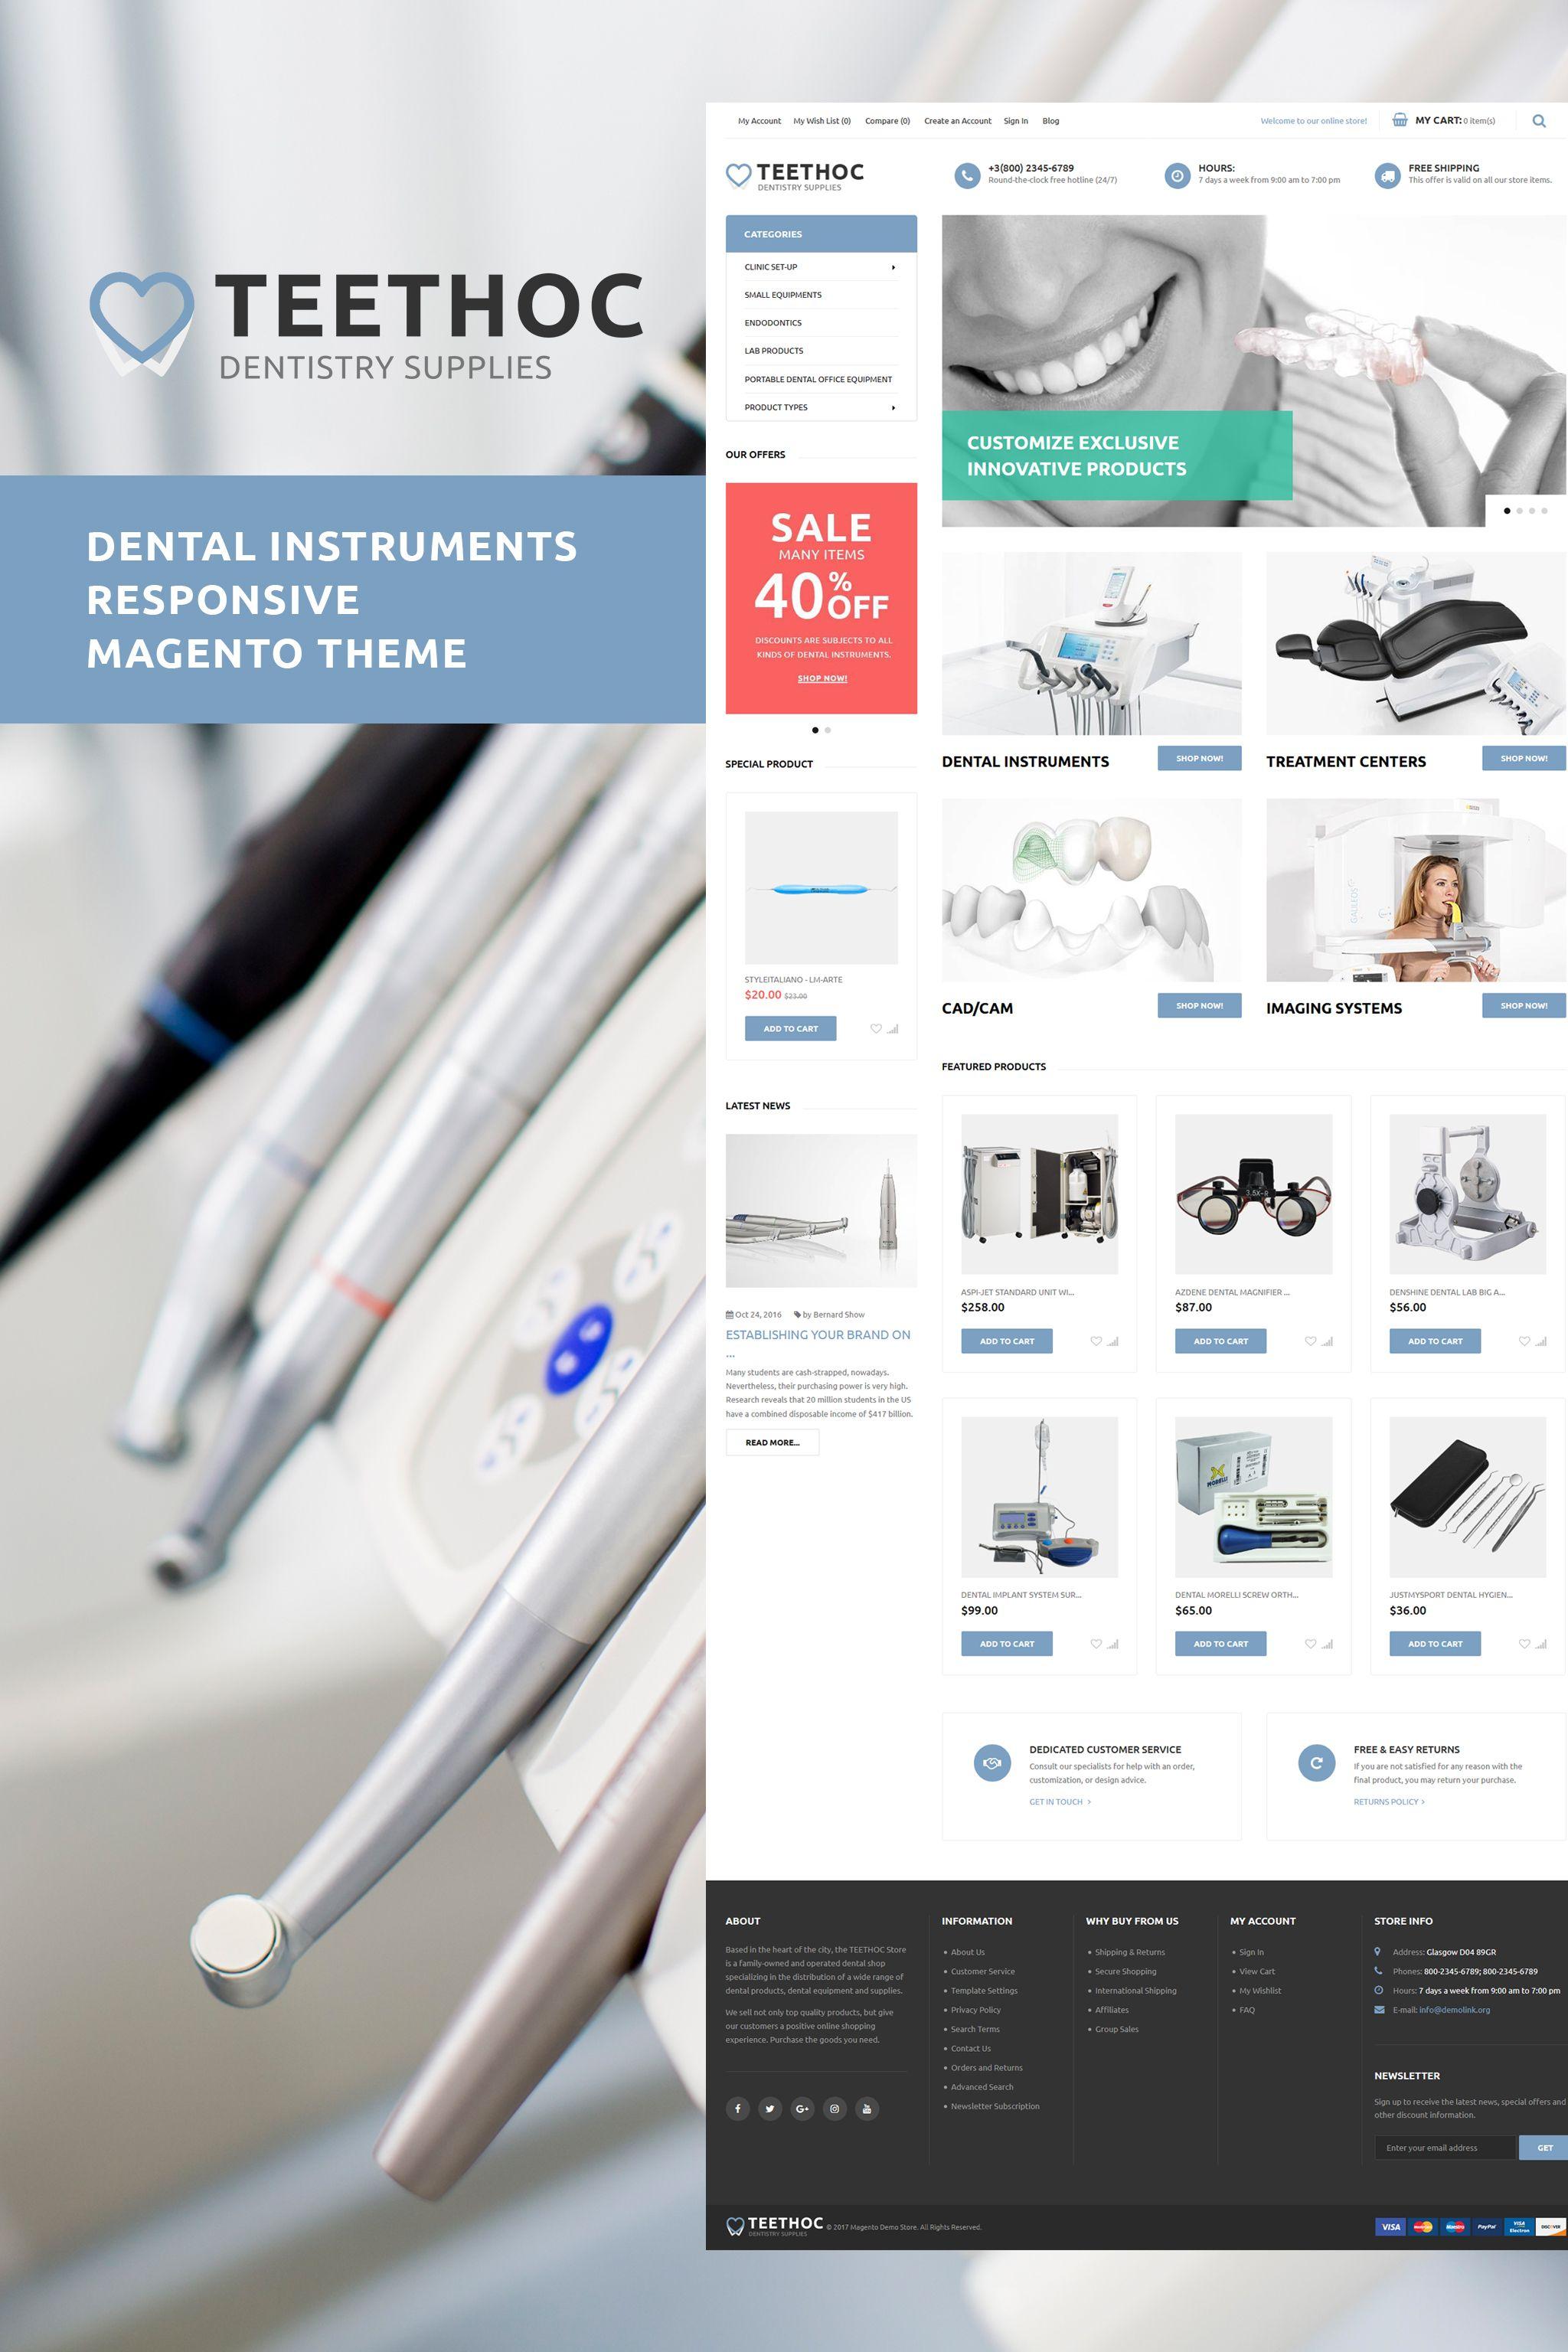 Teethoc Dental Instruments Magento Theme Pinterest